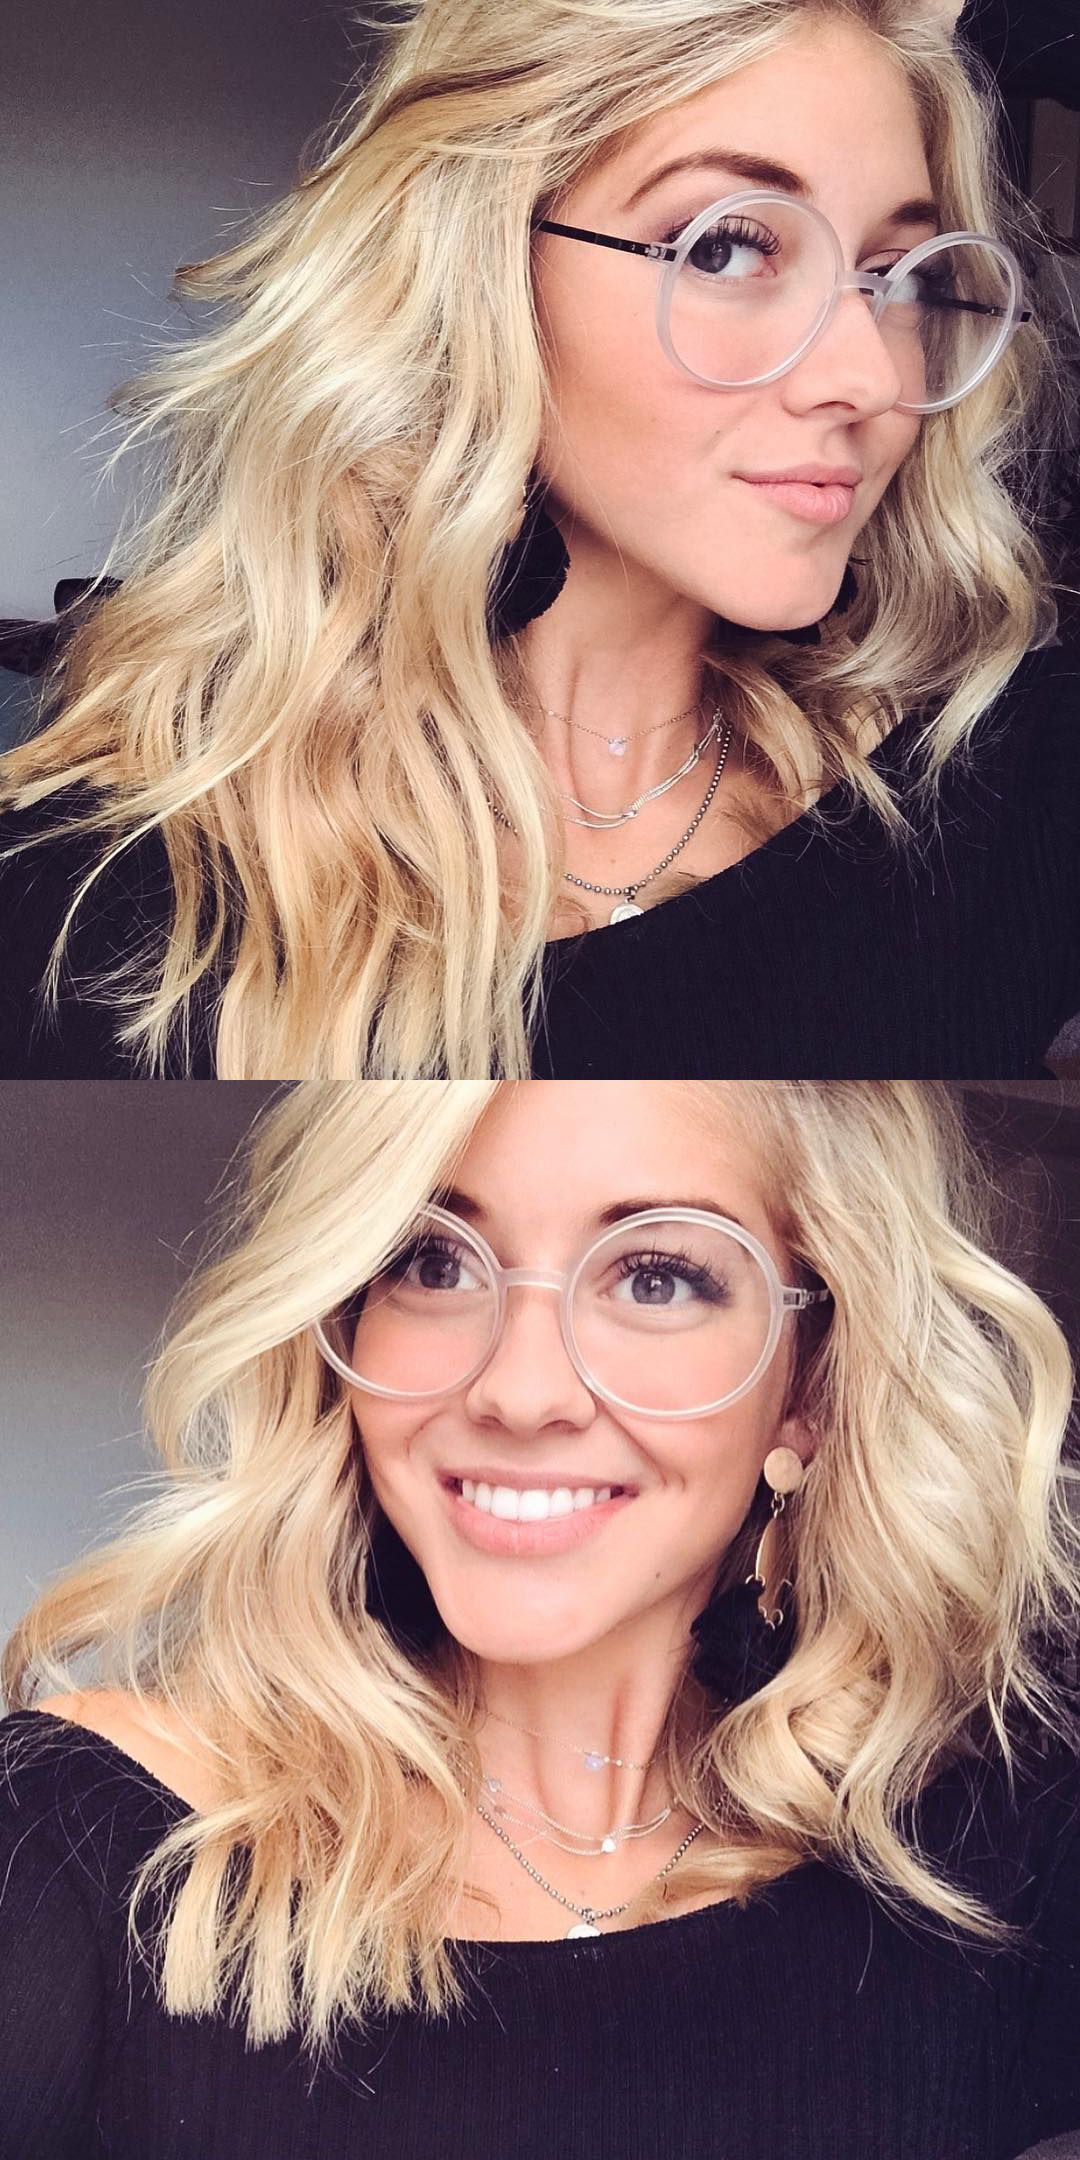 Women Eyeglasses Frames For Anana 2019Mykita In ukTOPXiZ